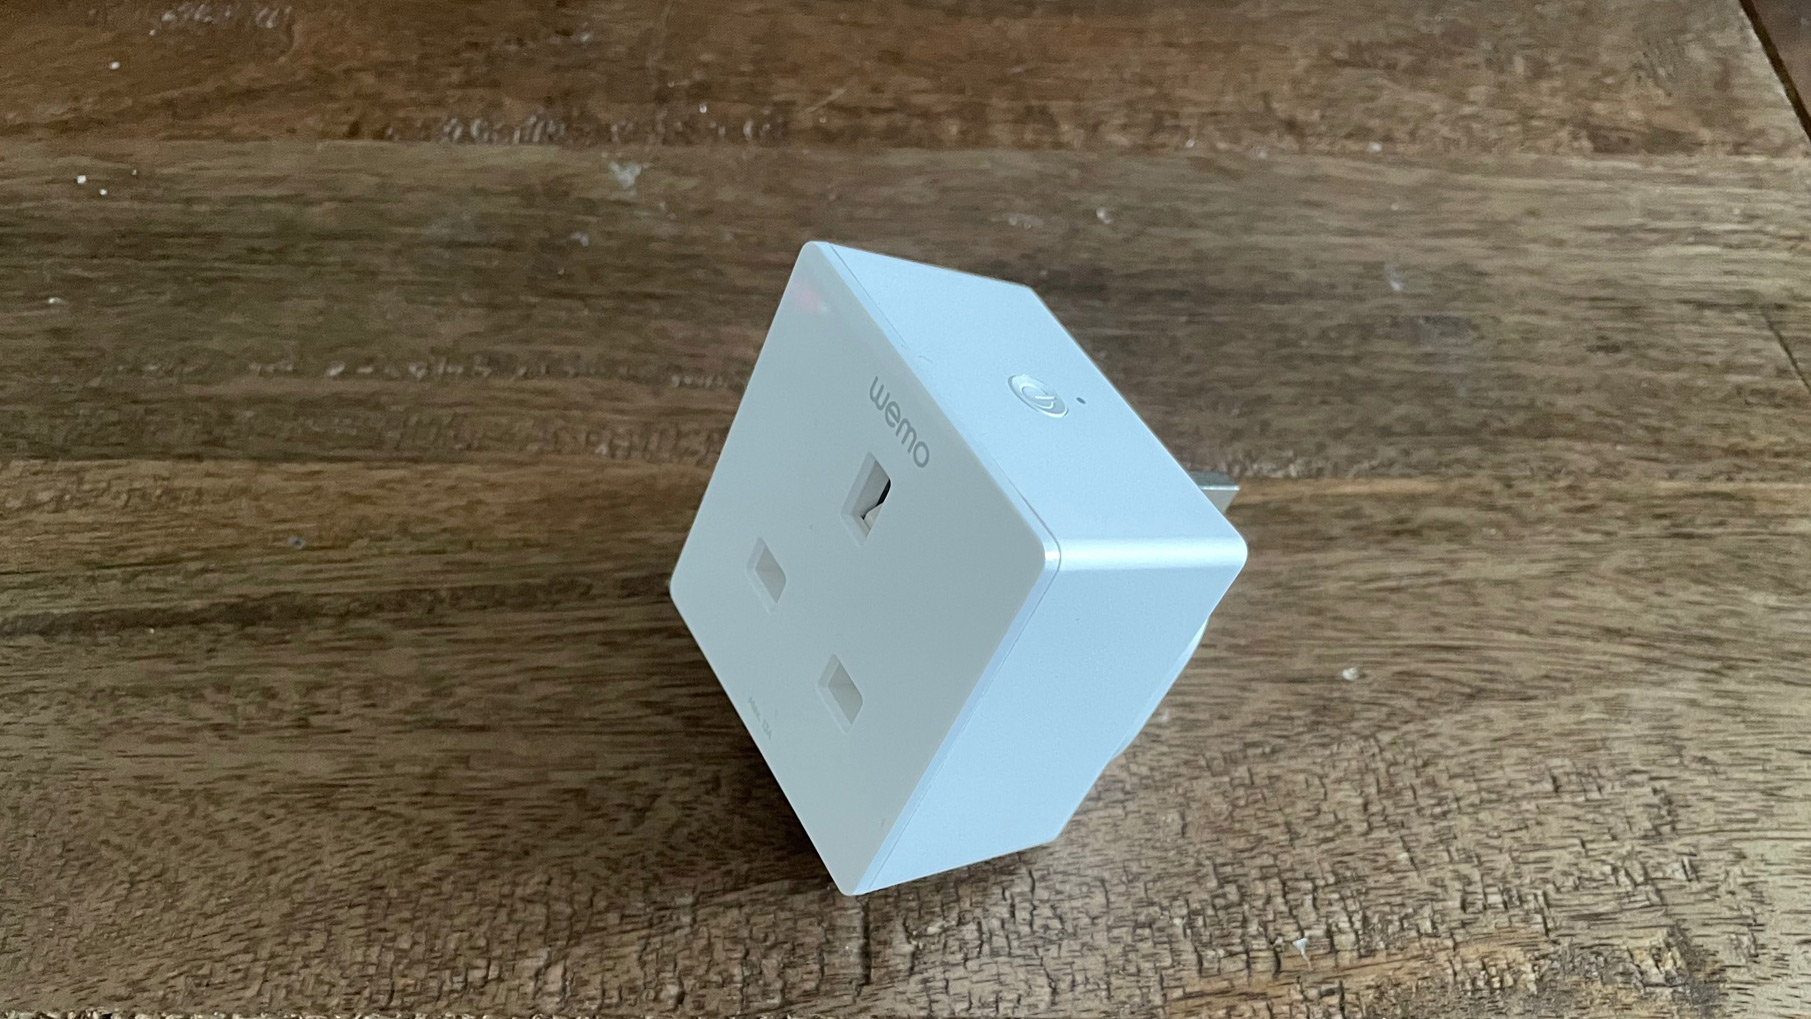 Wemo Wifi smart plug on a table